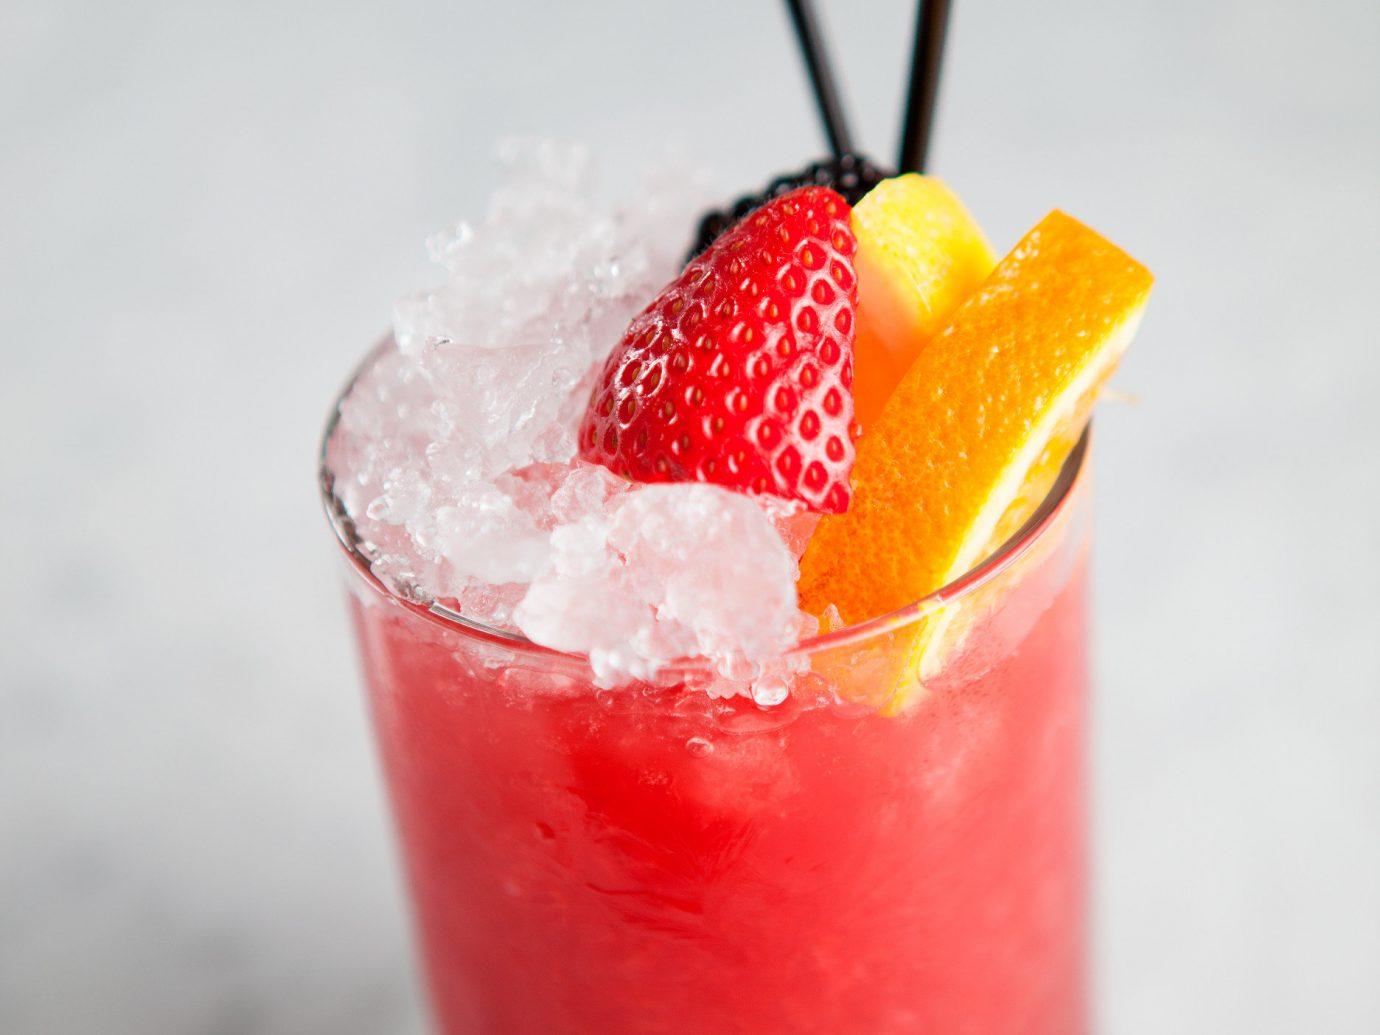 Food + Drink food Drink cocktail beverage produce alcoholic beverage non alcoholic beverage slush fruit strawberry mai tai strawberries orange pink lady fruit drink